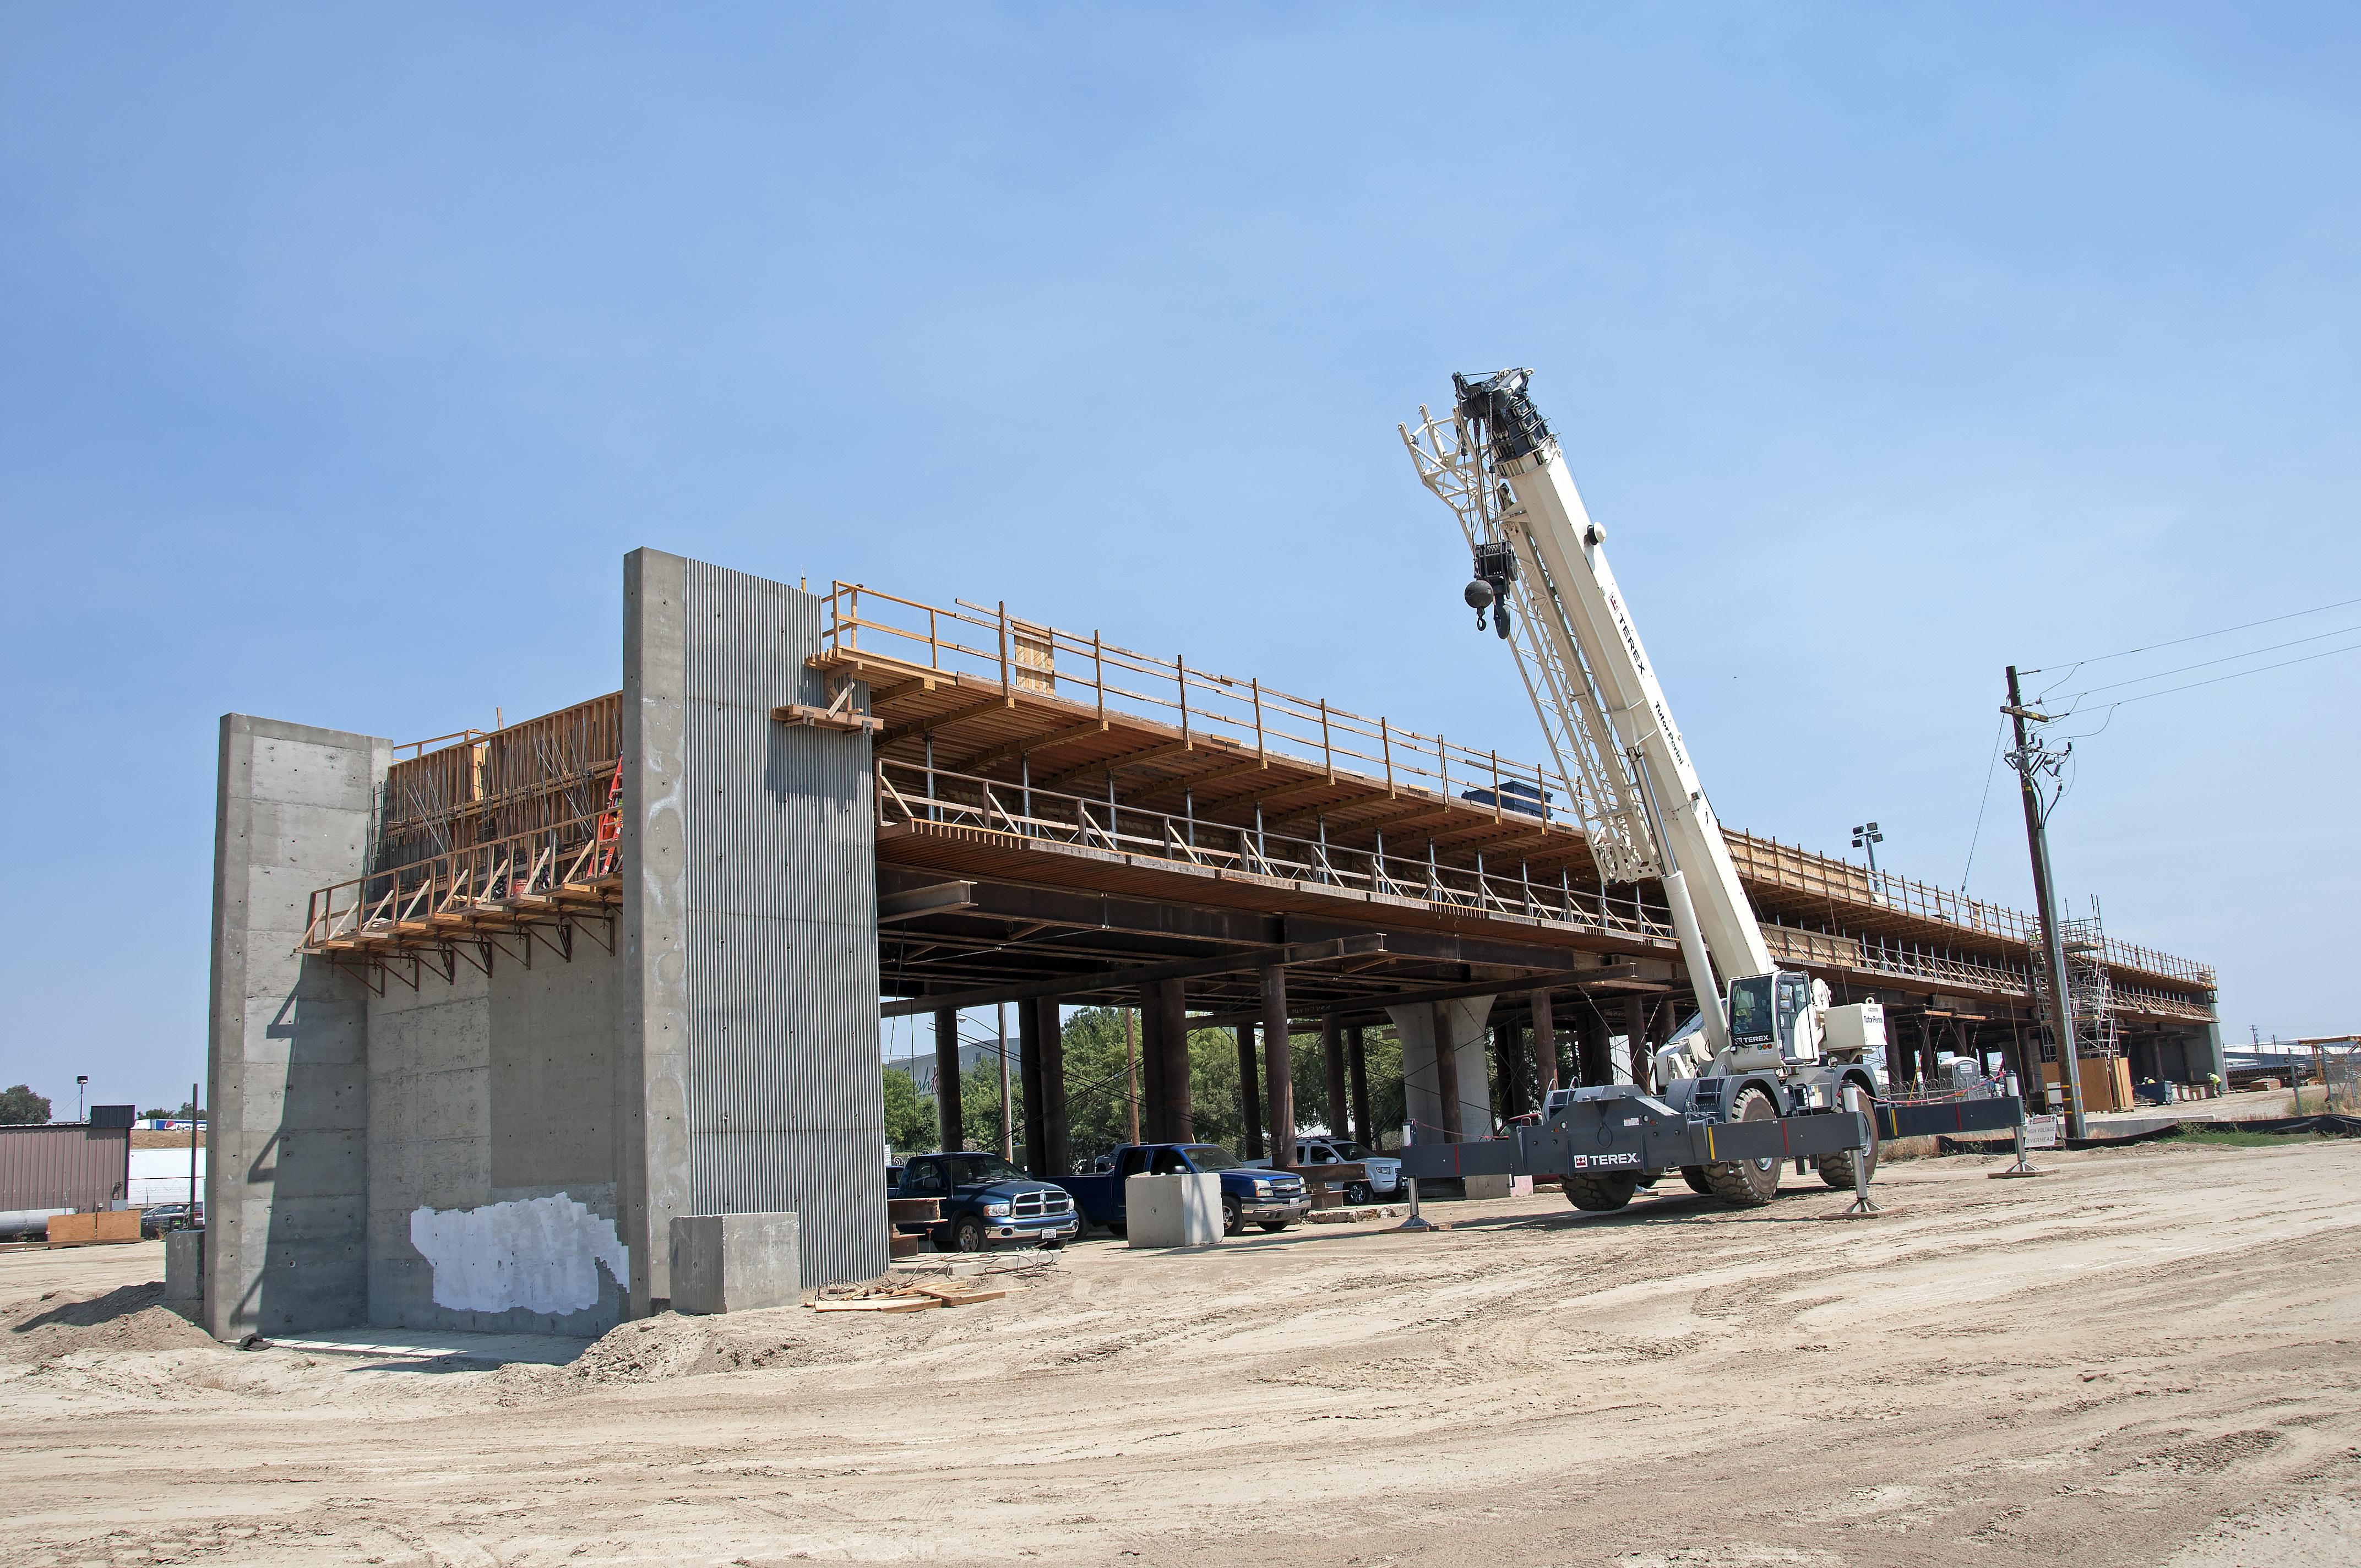 Metro leaders eye high-speed rail money for LA transit projects